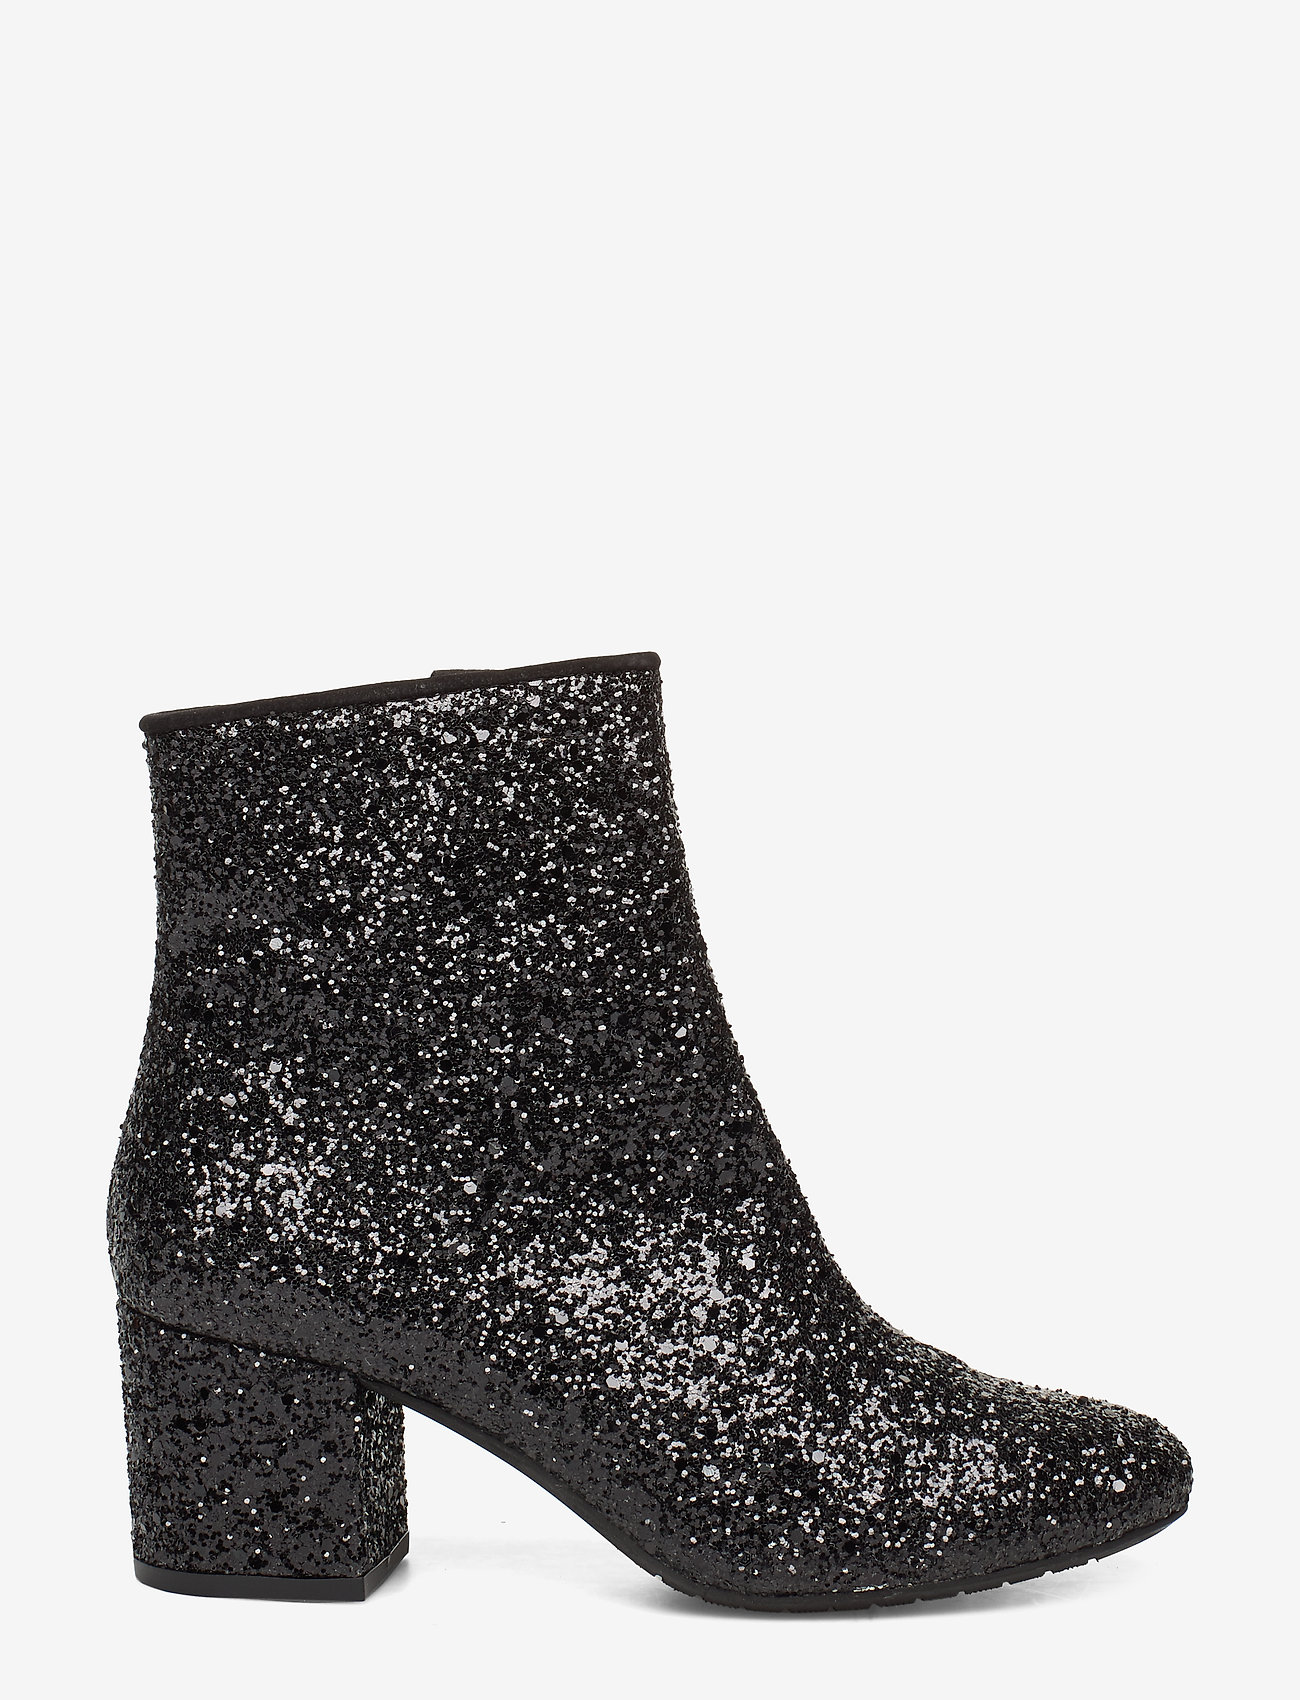 ANGULUS - Bootie - block heel - with zippe - heeled ankle boots - 2486/1163 black glit/black - 1